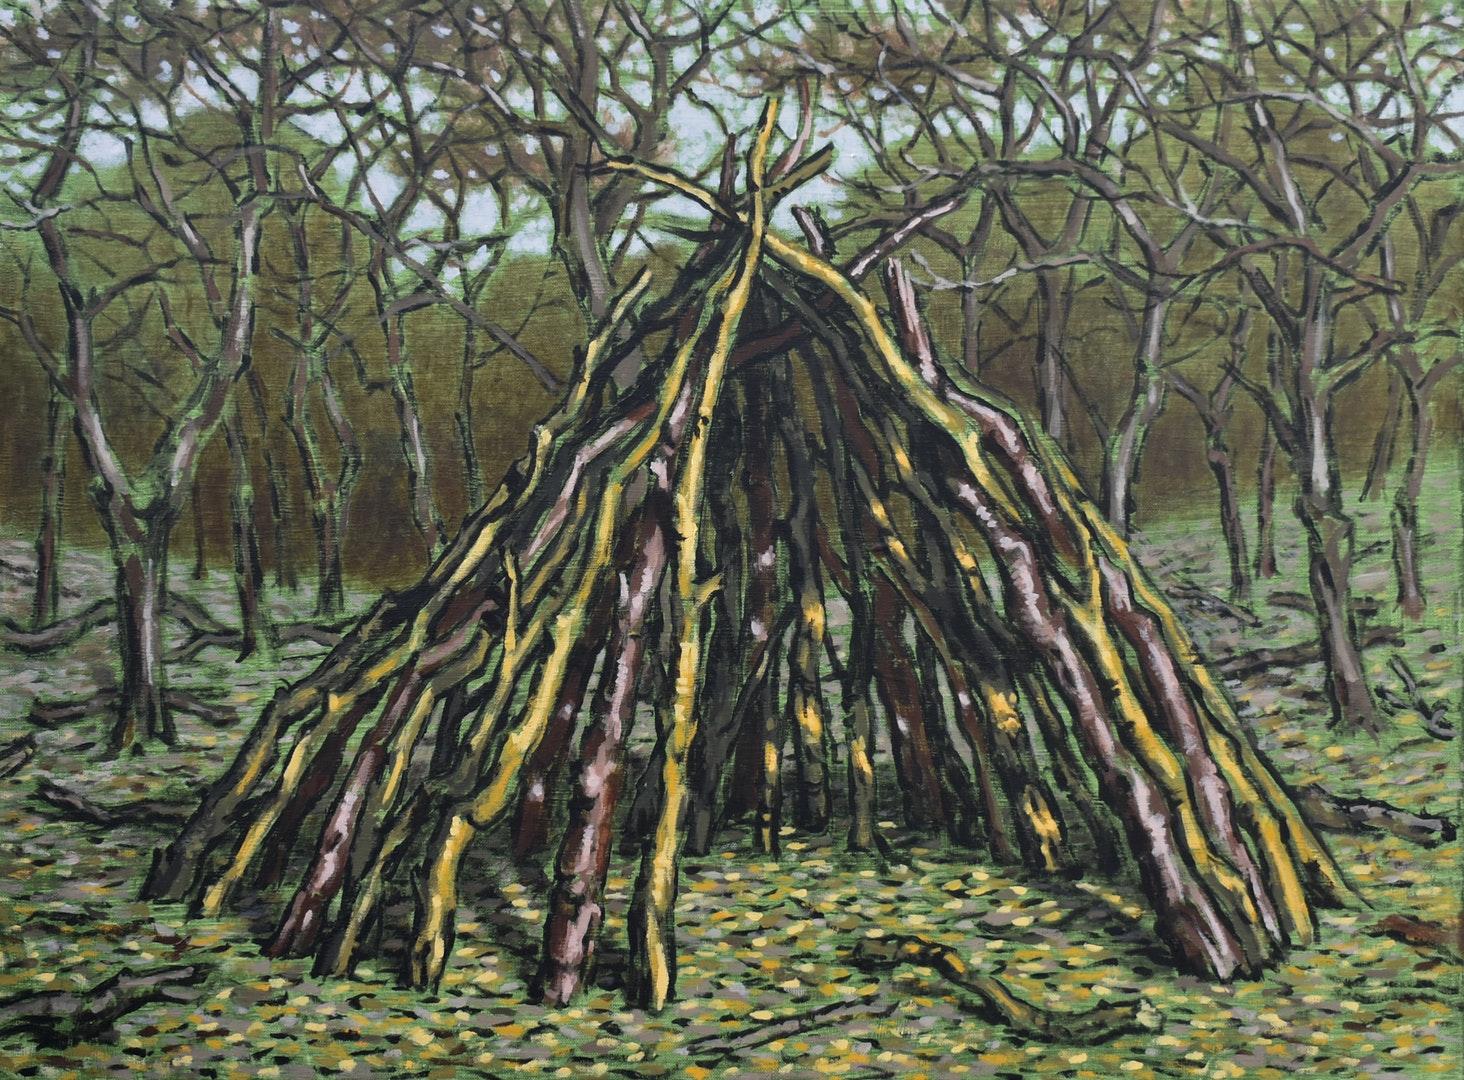 'Green Shelter', Jack Hicks, Acrylic on linen, 60 x 80 cm